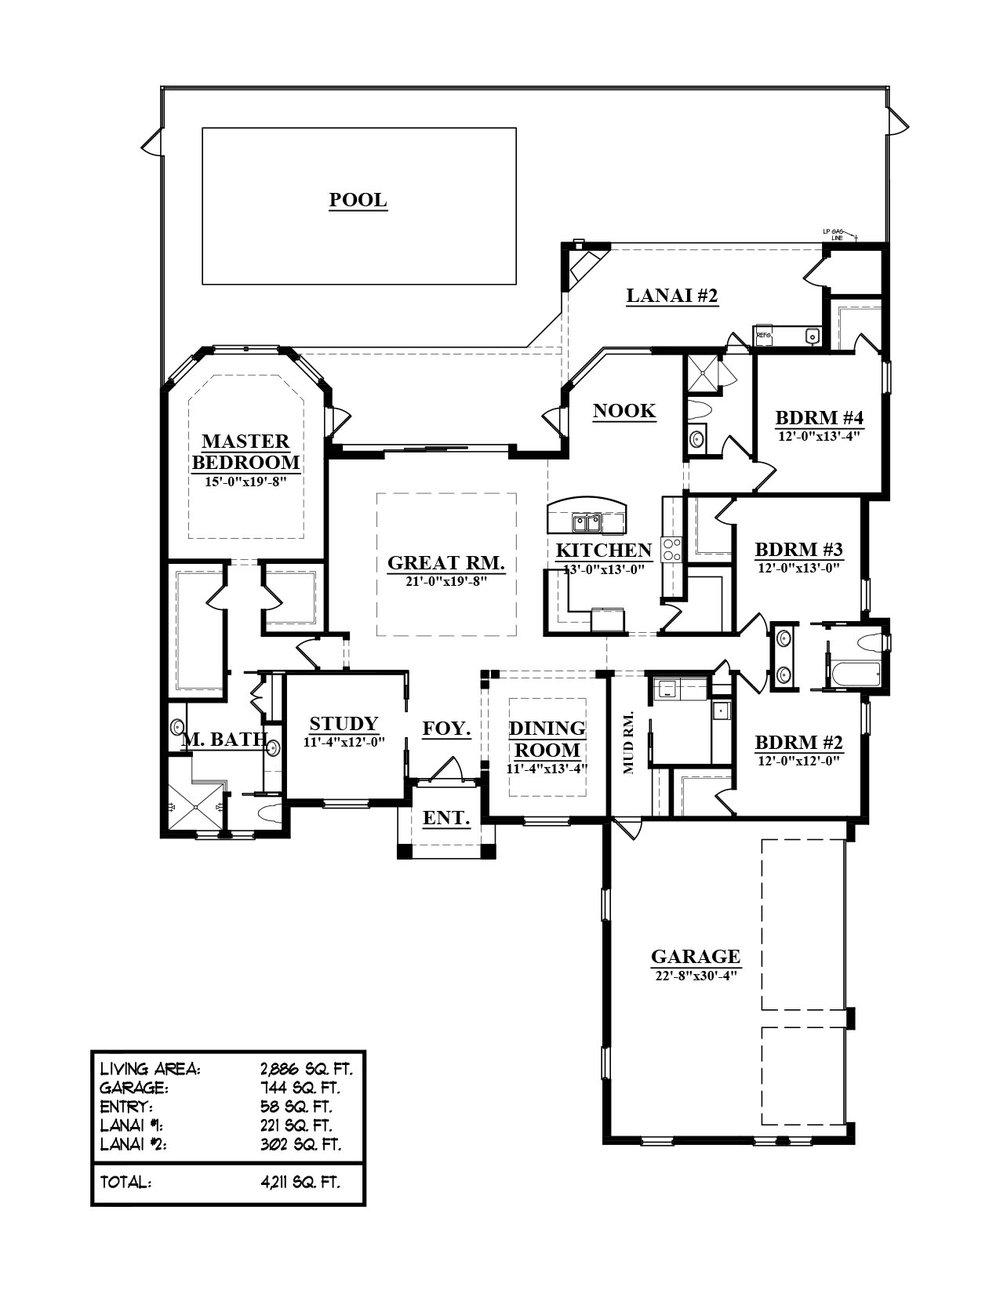 Ernie White Floor Plans_0009_HIGHPOINTe PROOF 2.jpg